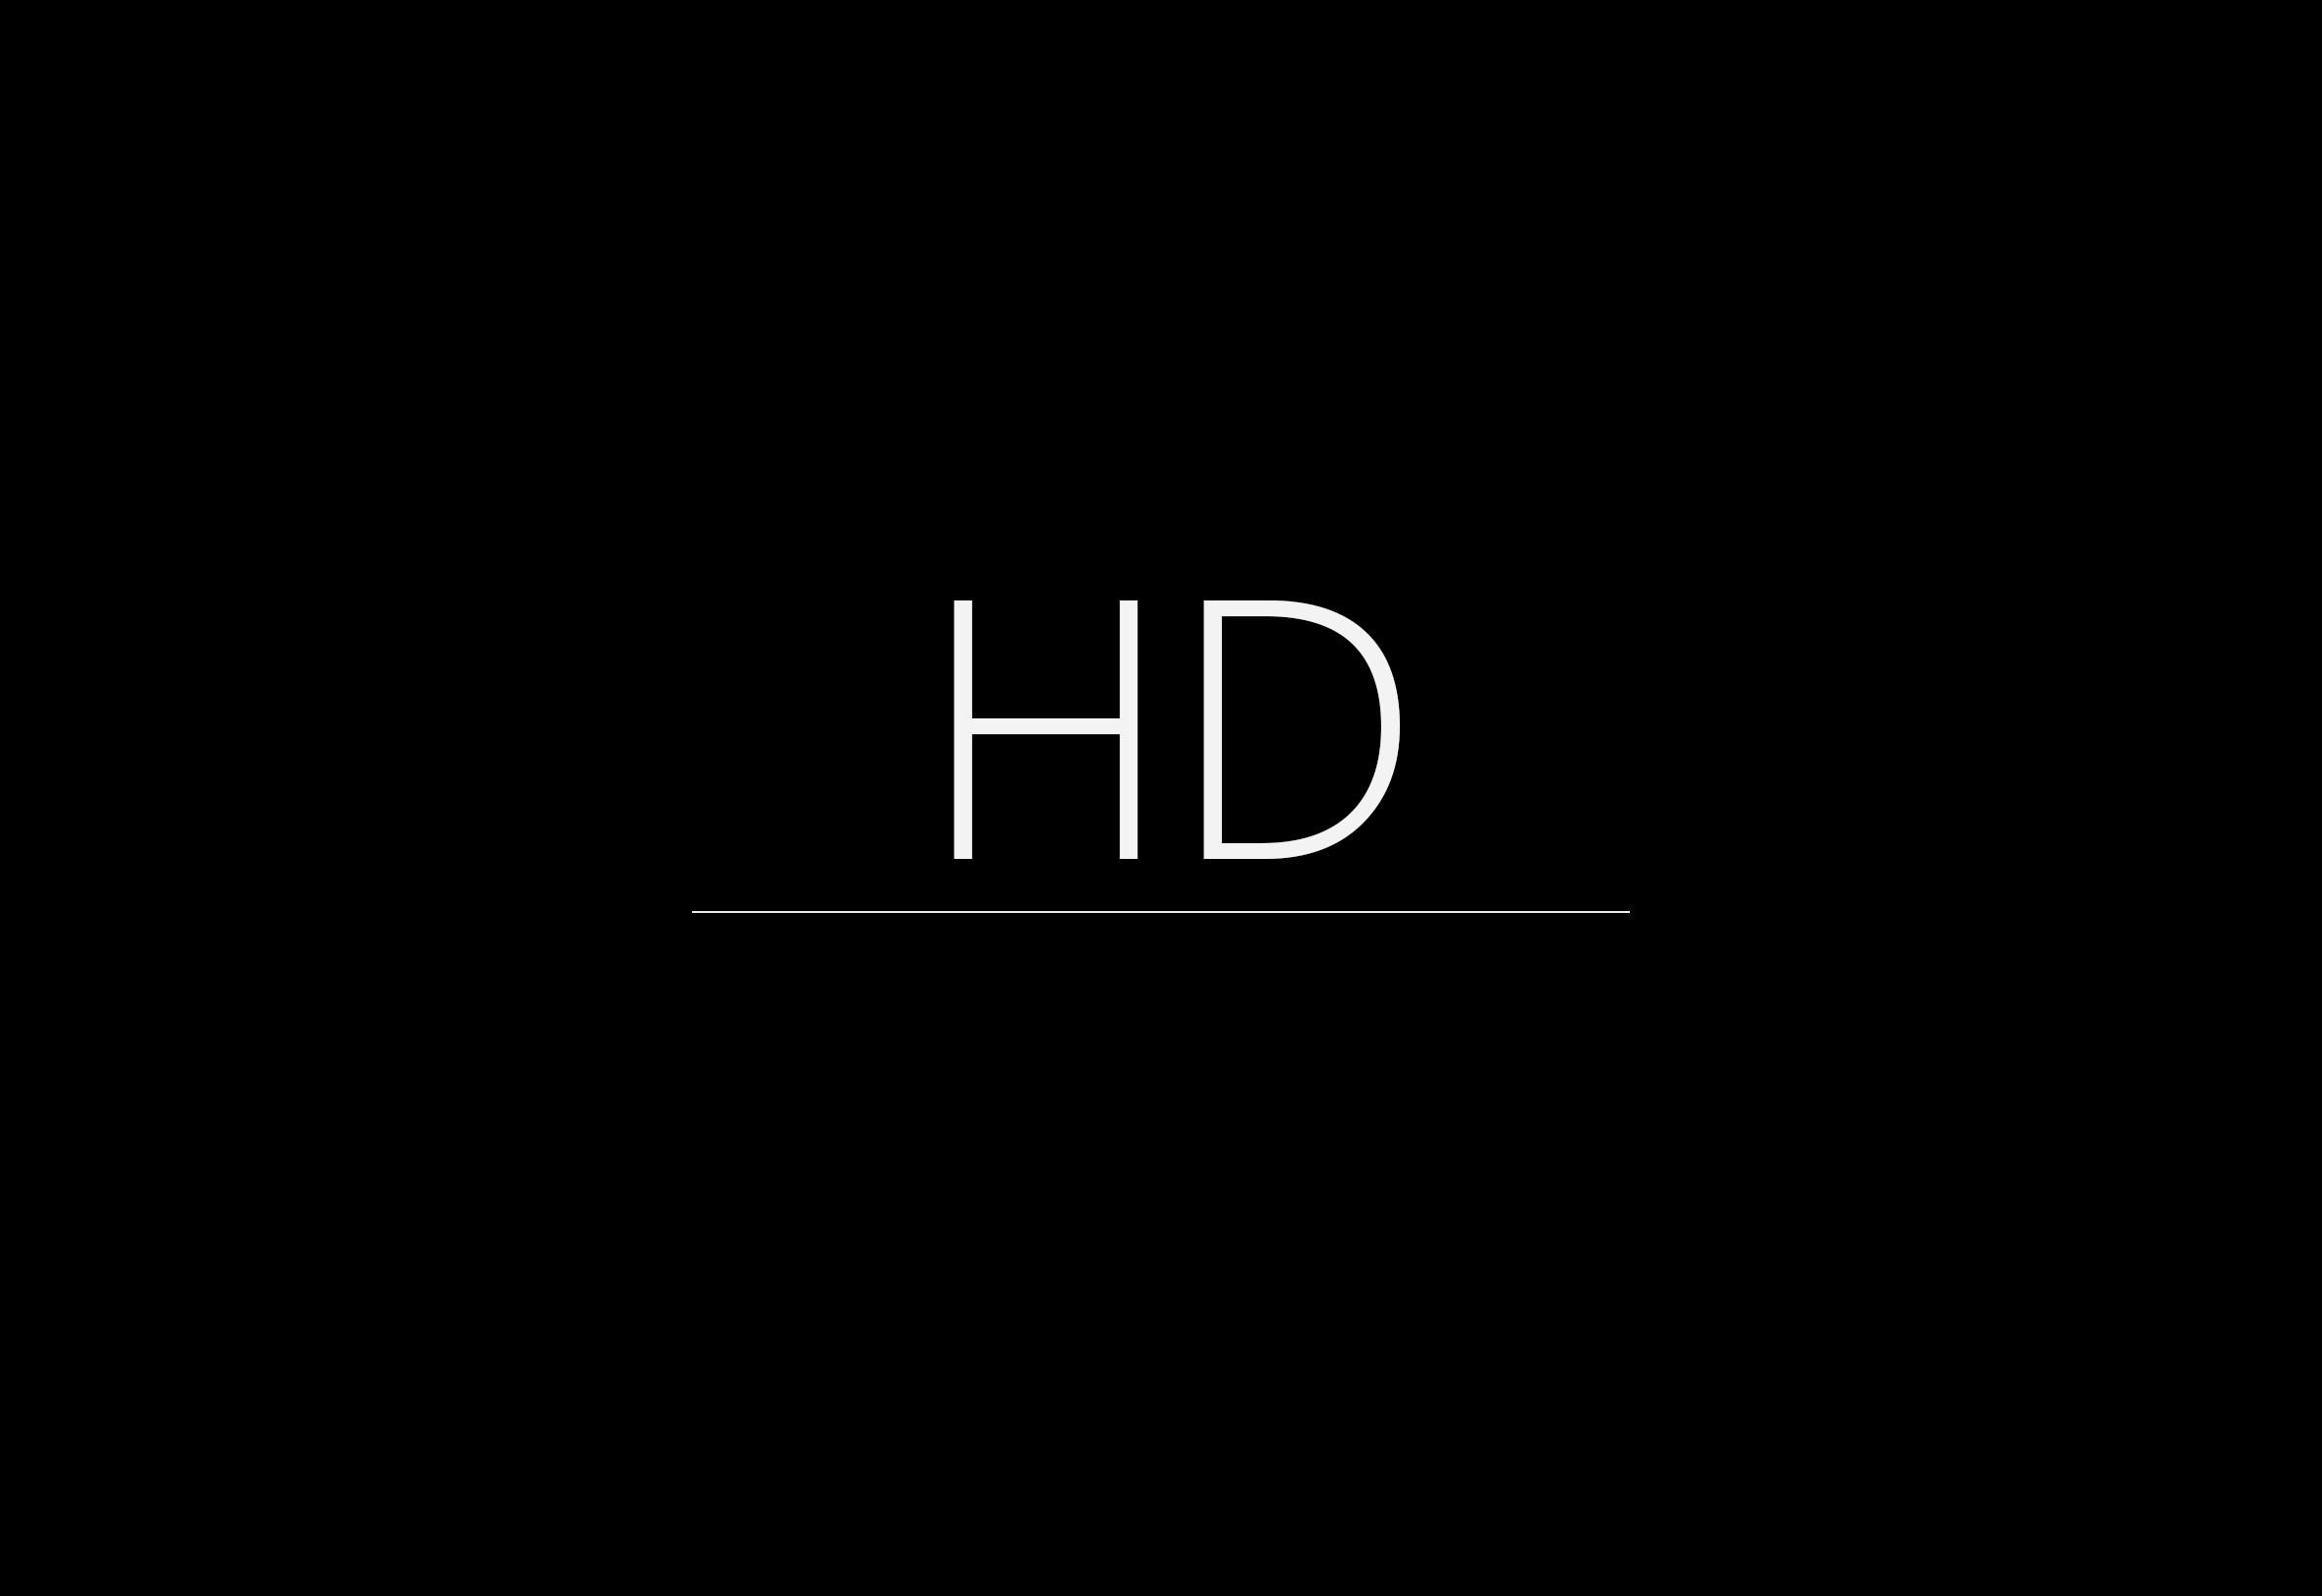 Presentation_HD_Title Page.jpg